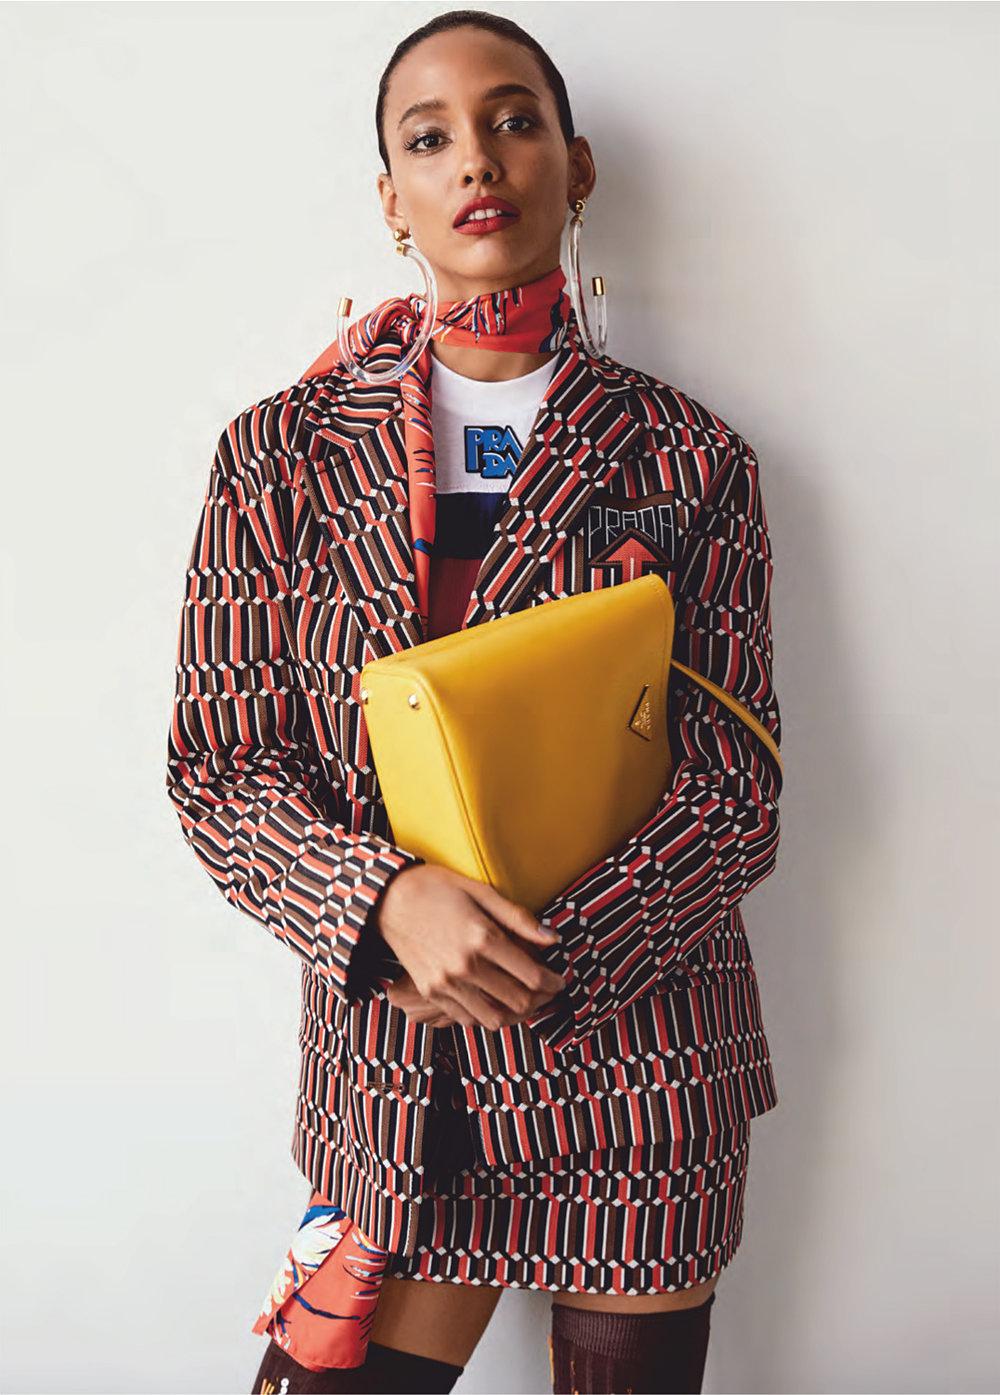 Cora Emmanuel by Owen Bruce for Elle Canada Feb 2019 (11).jpg